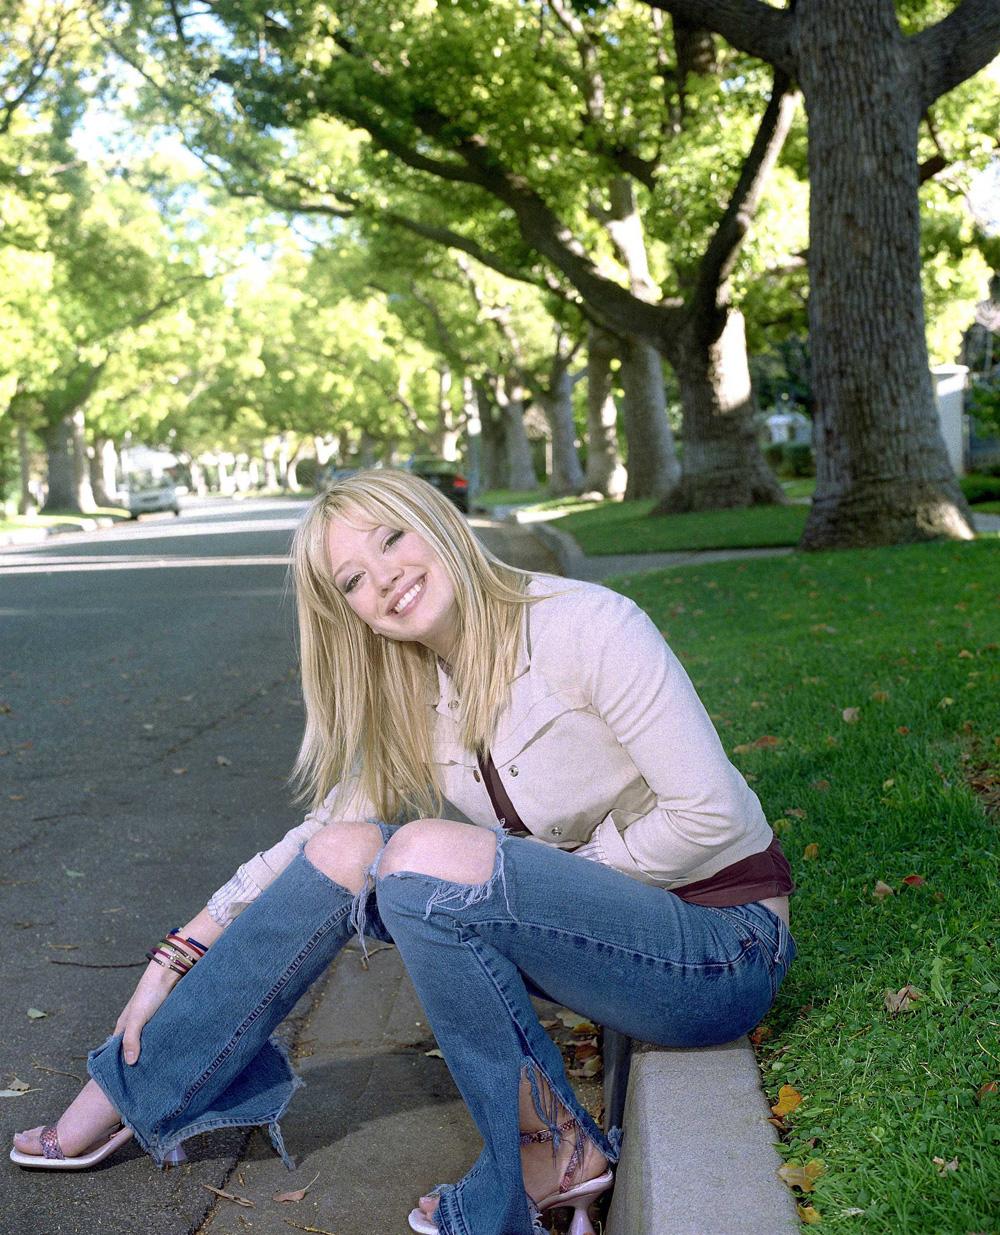 http://st.kinopoisk.ru/im/kadr/1/1/0/kinopoisk.ru-Hilary-Duff-1106866.jpg